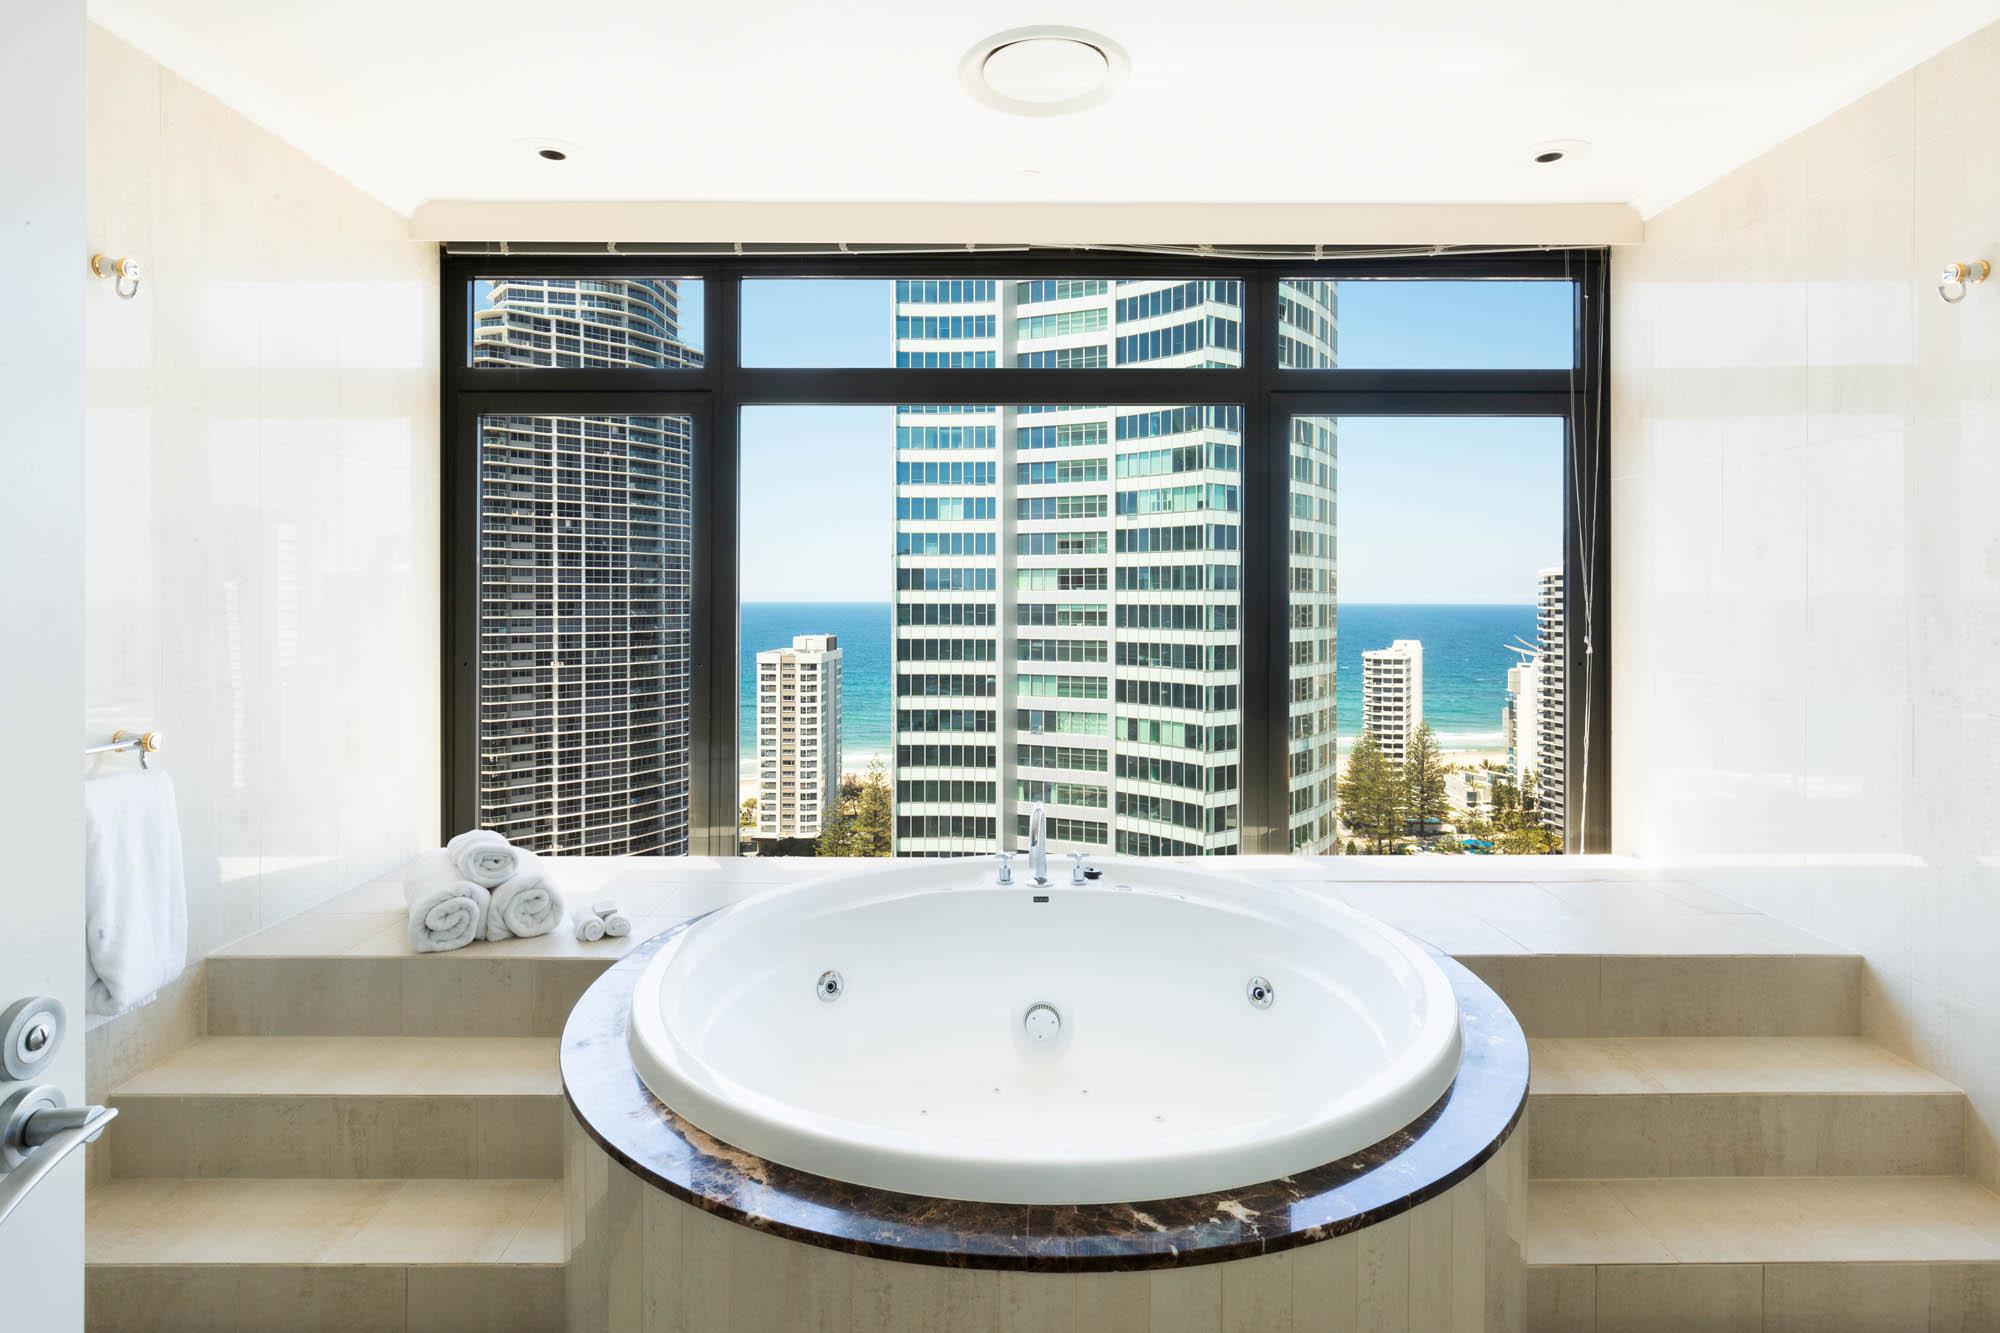 voco hotel gold coast fitout refurbishment construction executive suite spa bathroom retreat